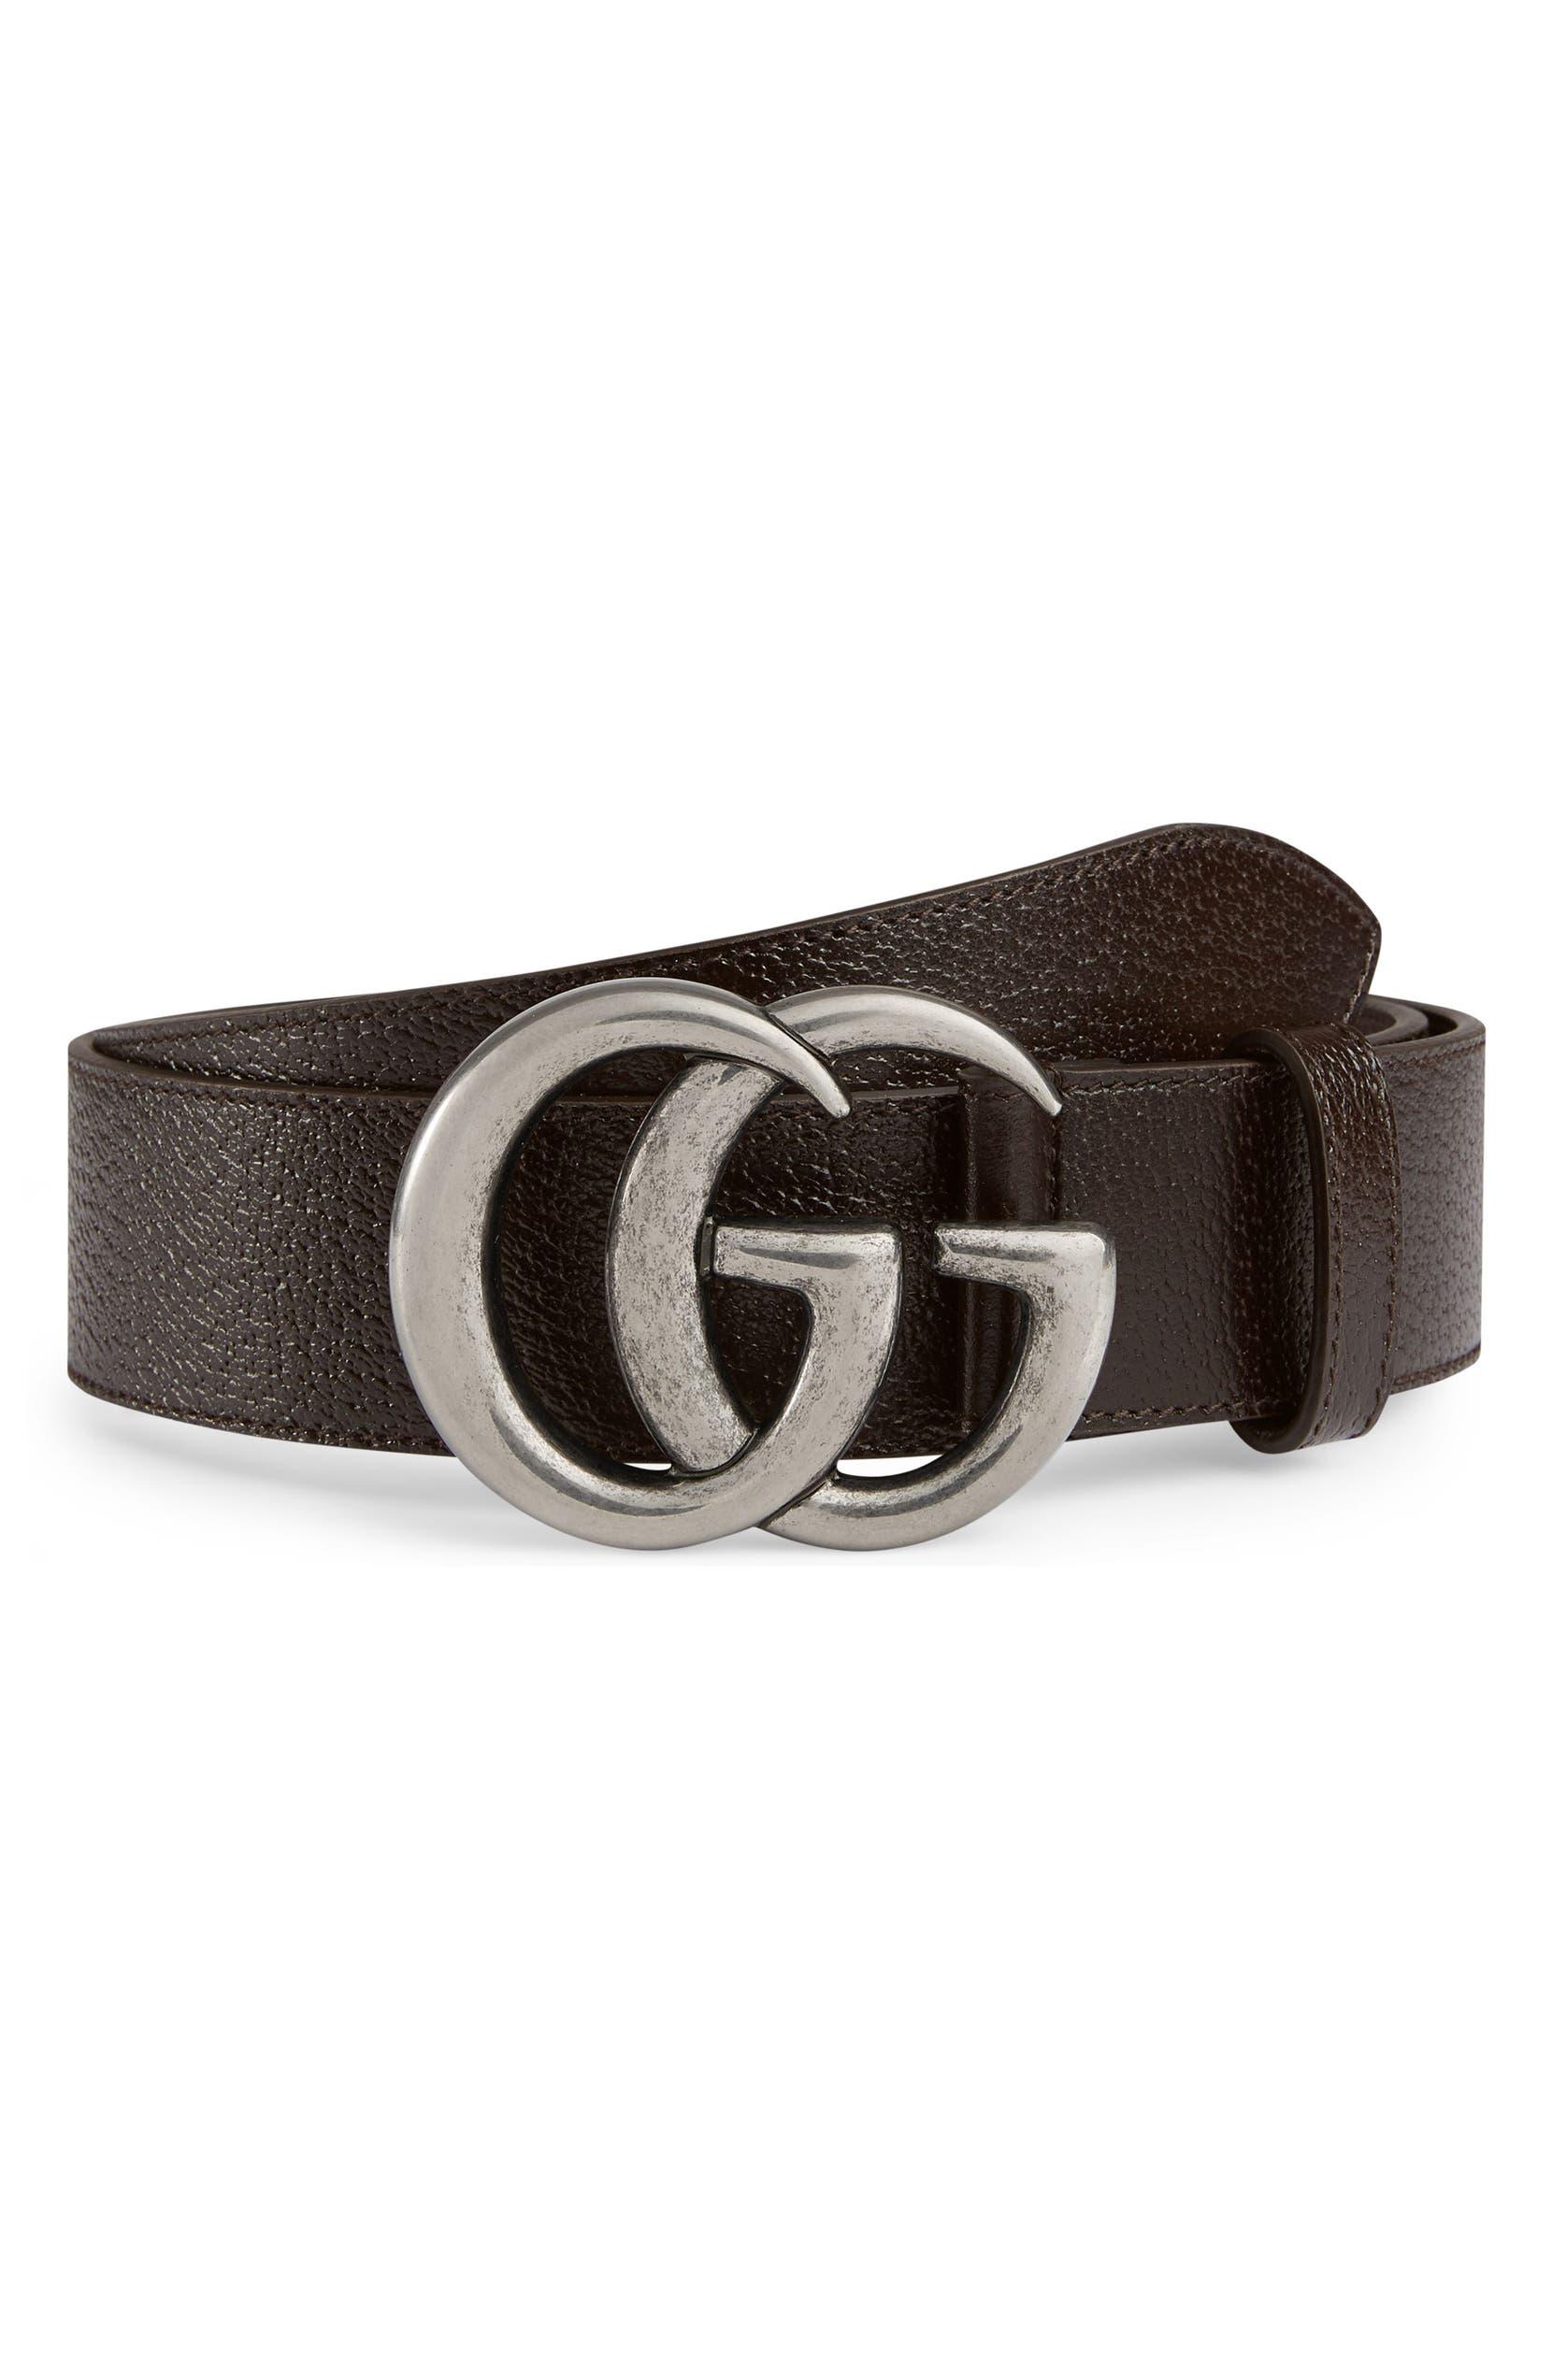 9f80c3bb9b5 Gucci GG Pebbled Leather Belt